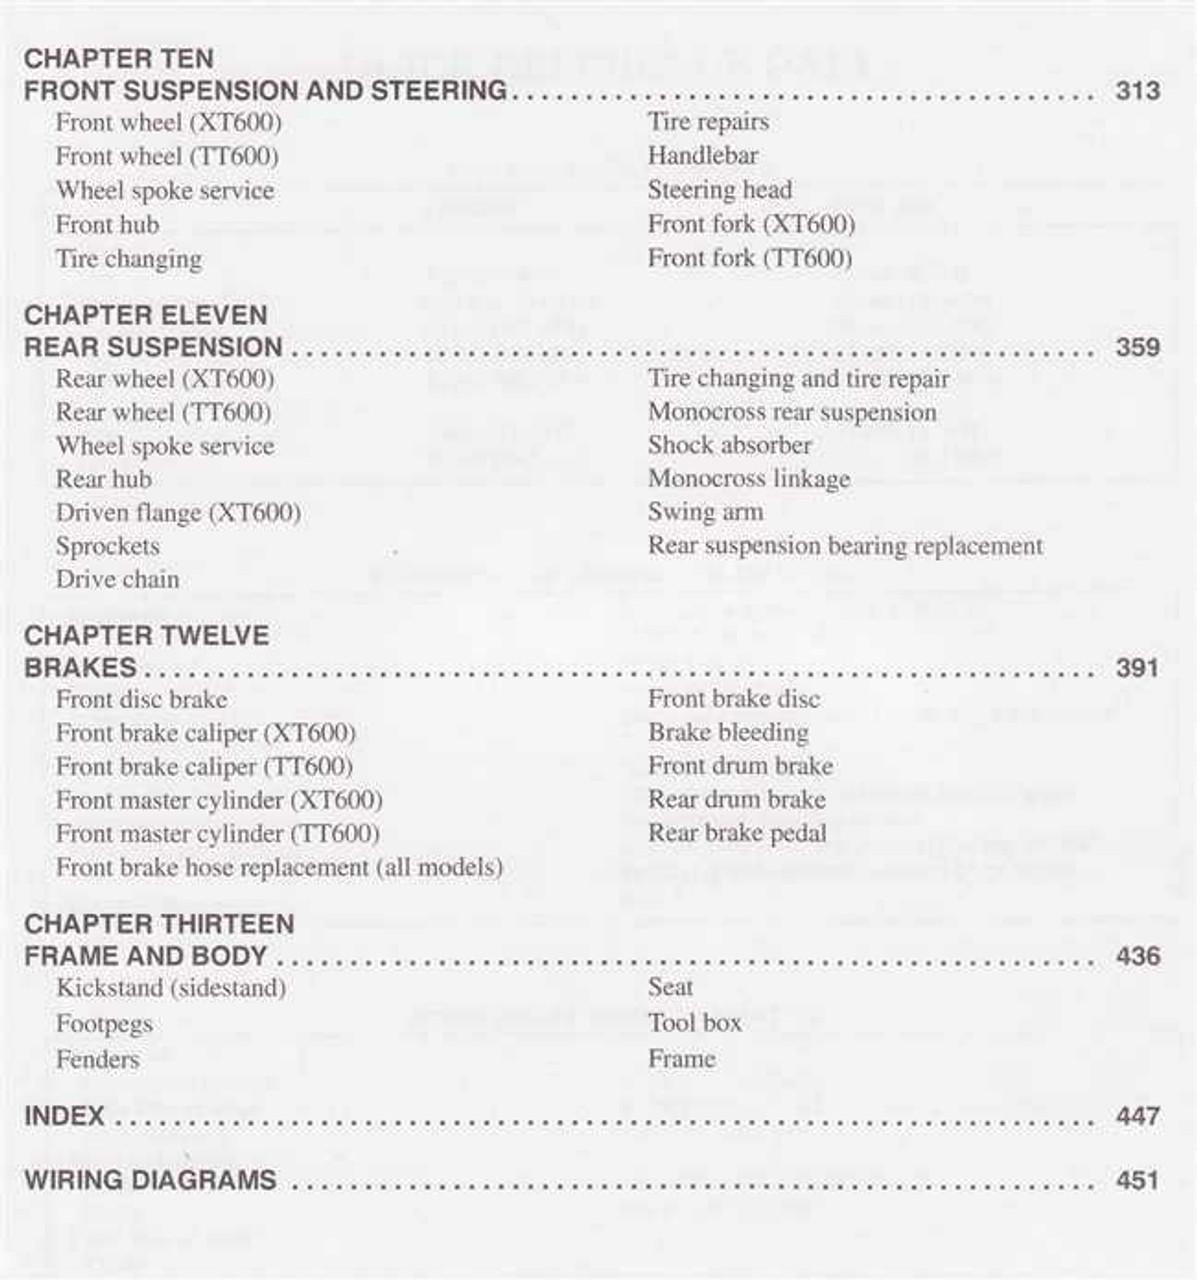 Yamaha Xt600 Tt600 1983 1989 Workshop Manual: Yamaha Tt600 Wiring Diagram At Eklablog.co